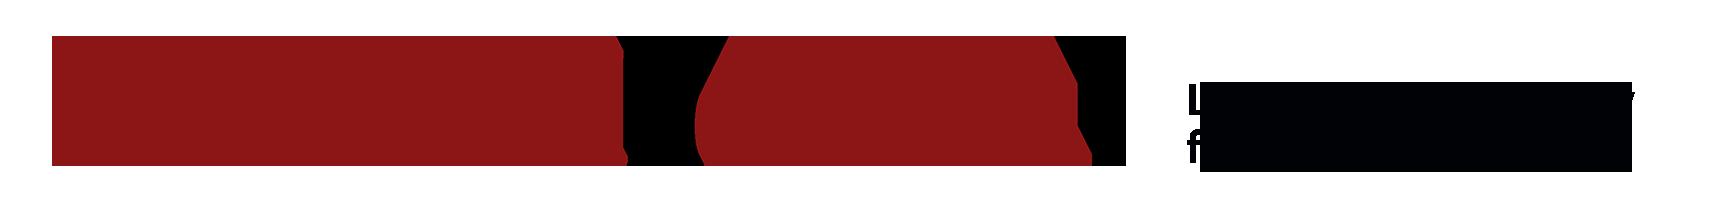 lad cddrl logo